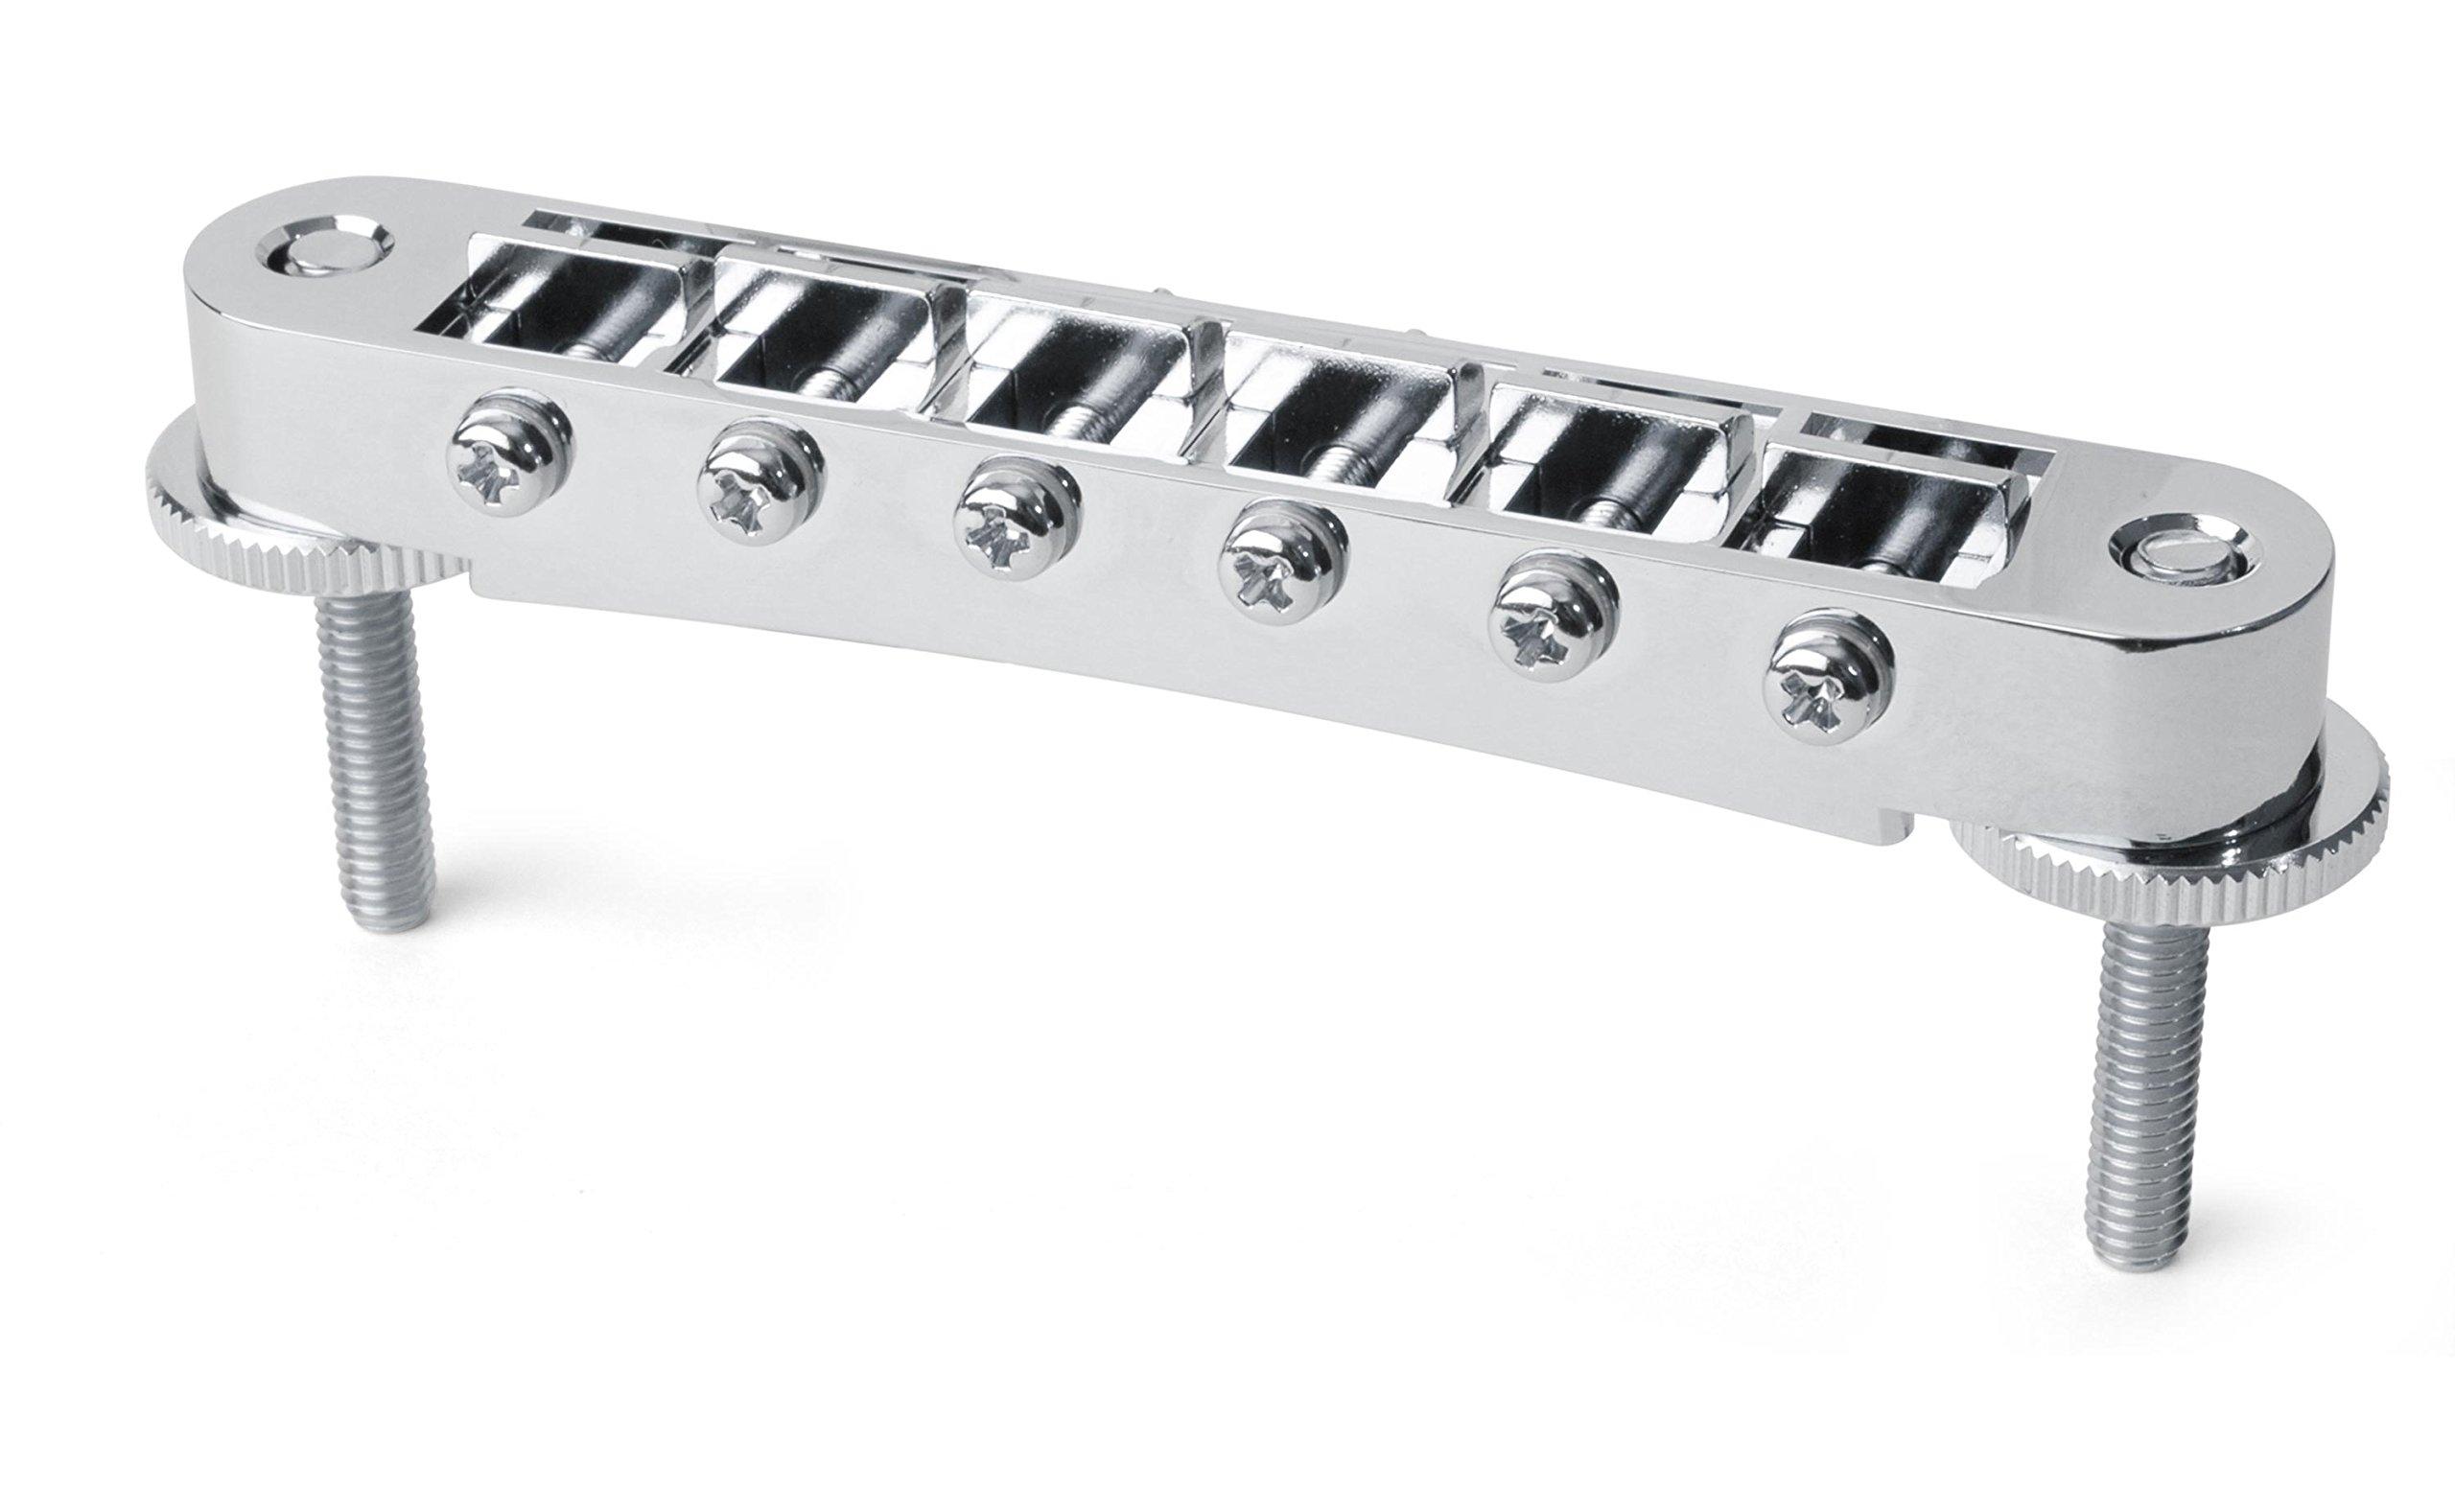 Gotoh Tune-o-matic Bridge with Standard Posts, Chrome